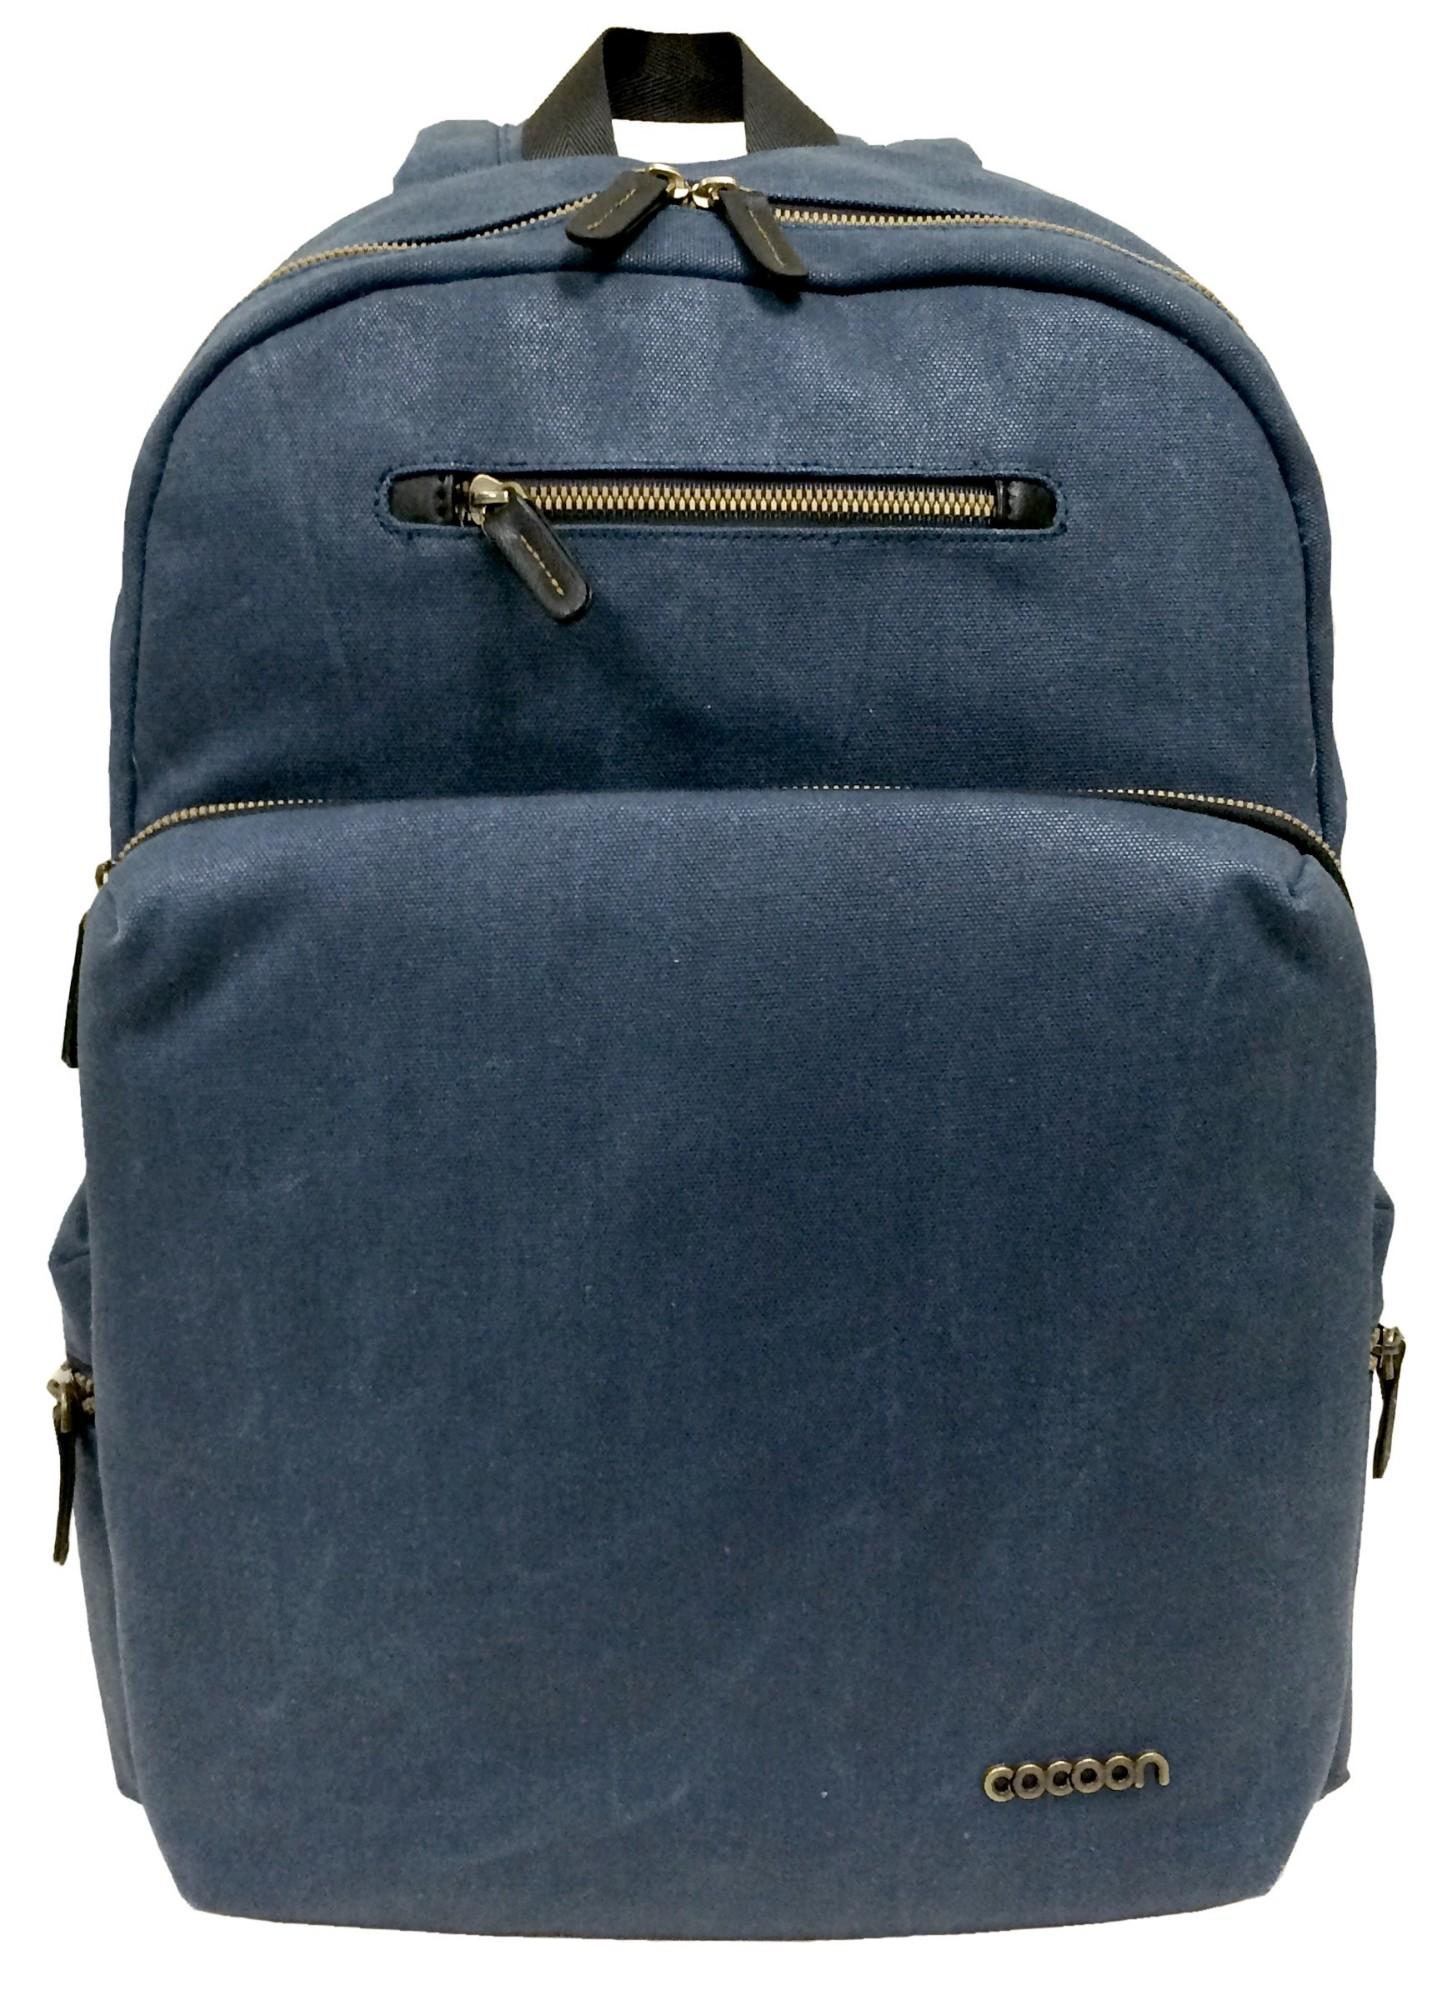 Cocoon Urban Adventure 16 Backpack - Bu